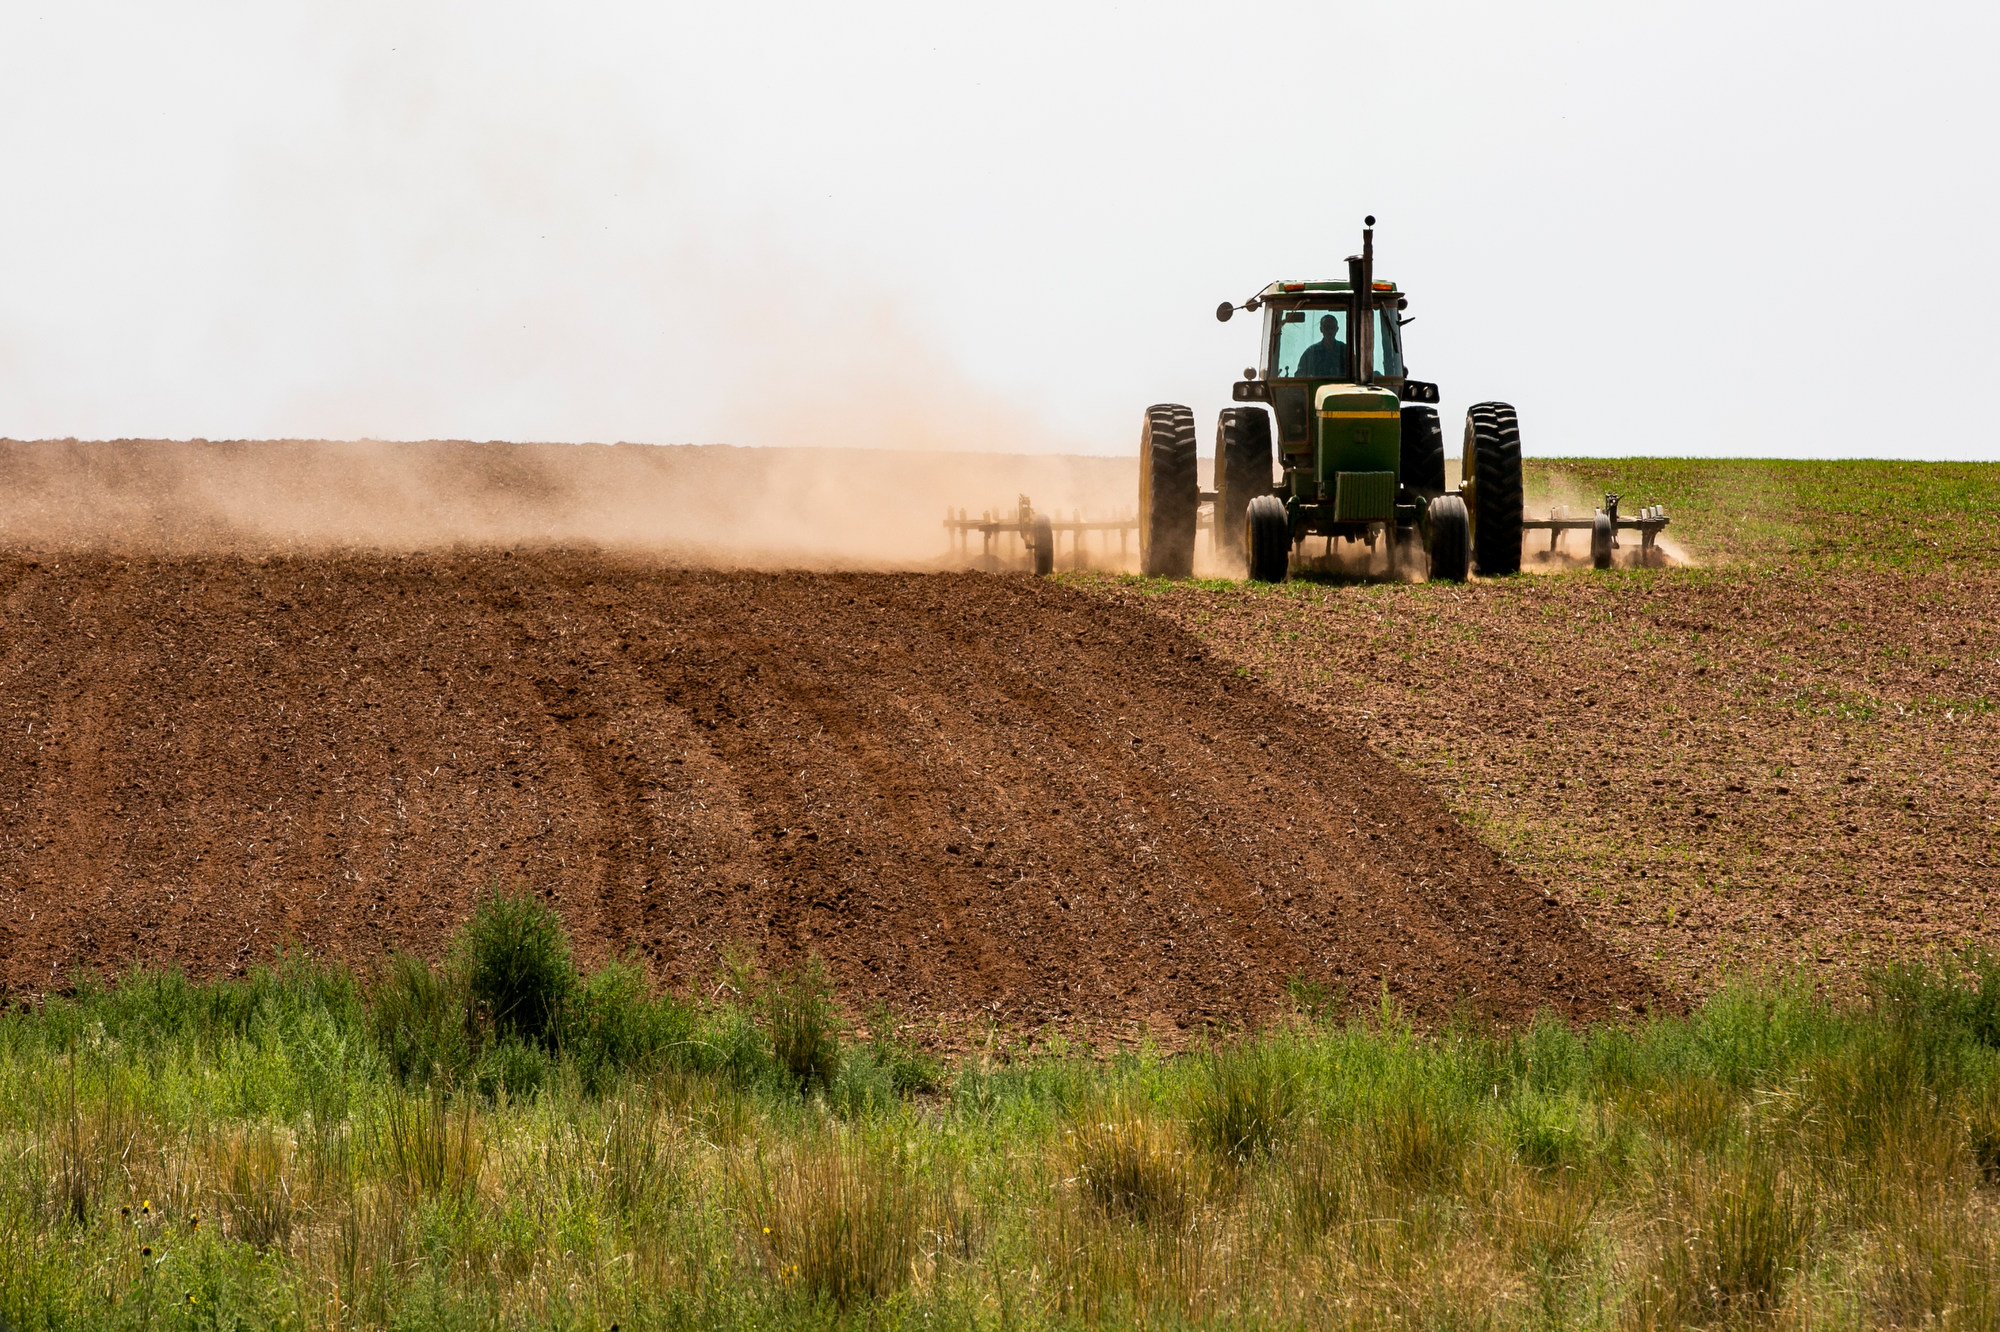 210830-DOVE-CREEK-FARMING-BEANS-AGRICULTURE